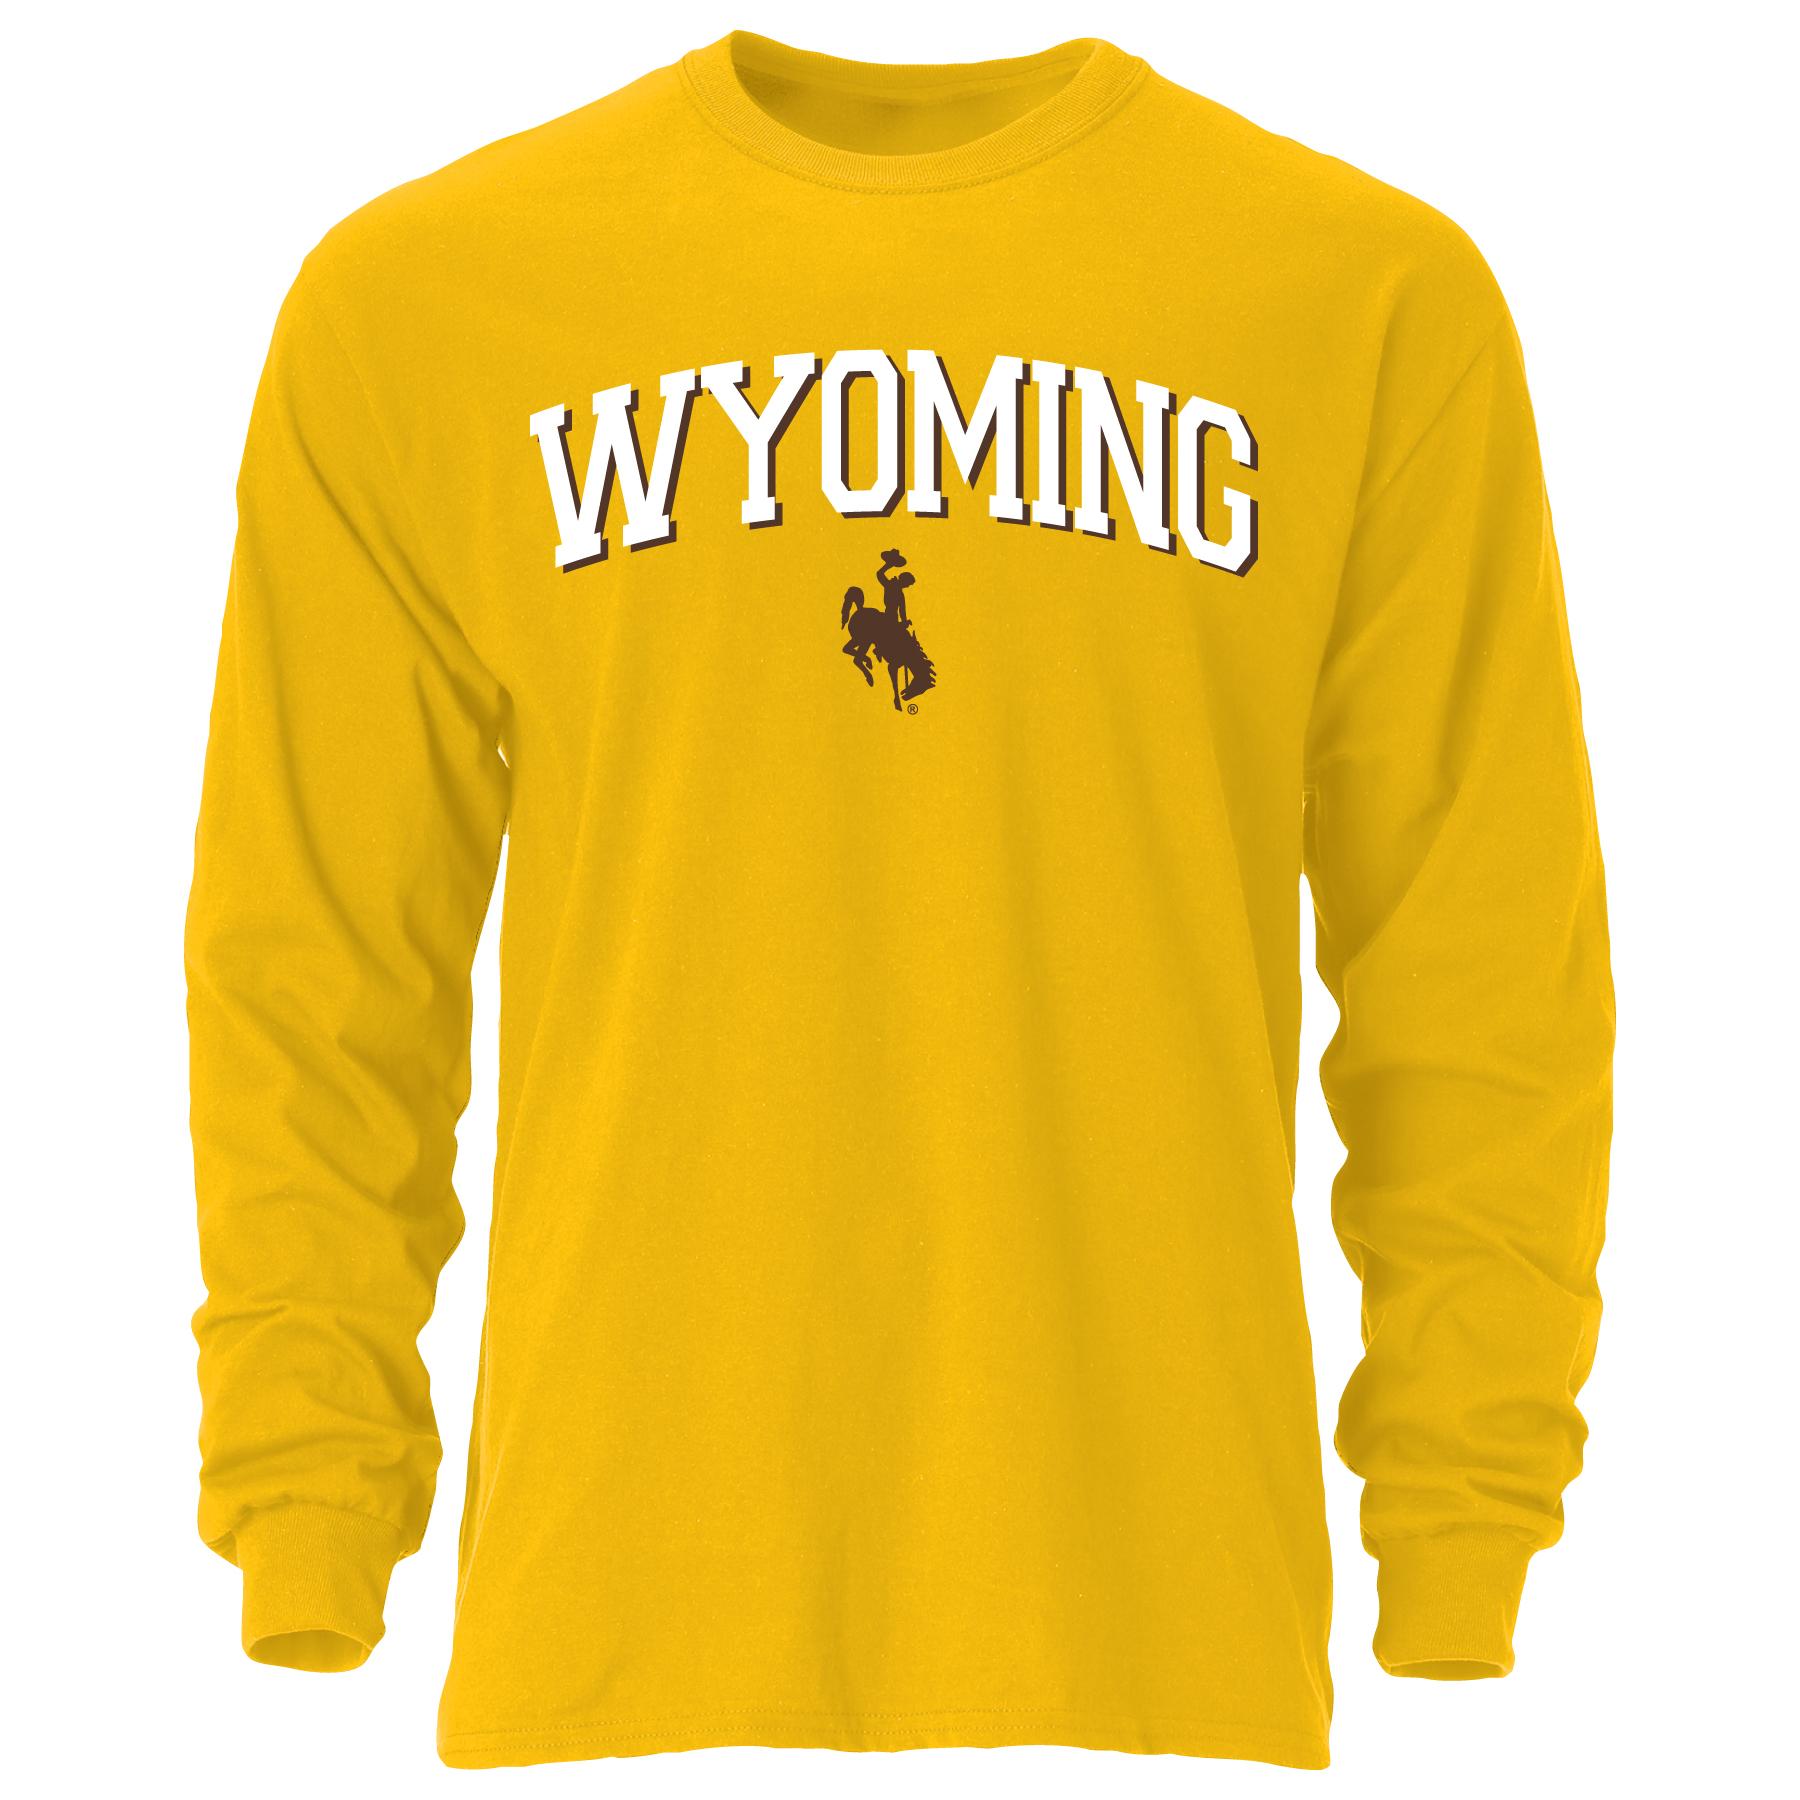 Wyoming Long Sleeve Tee